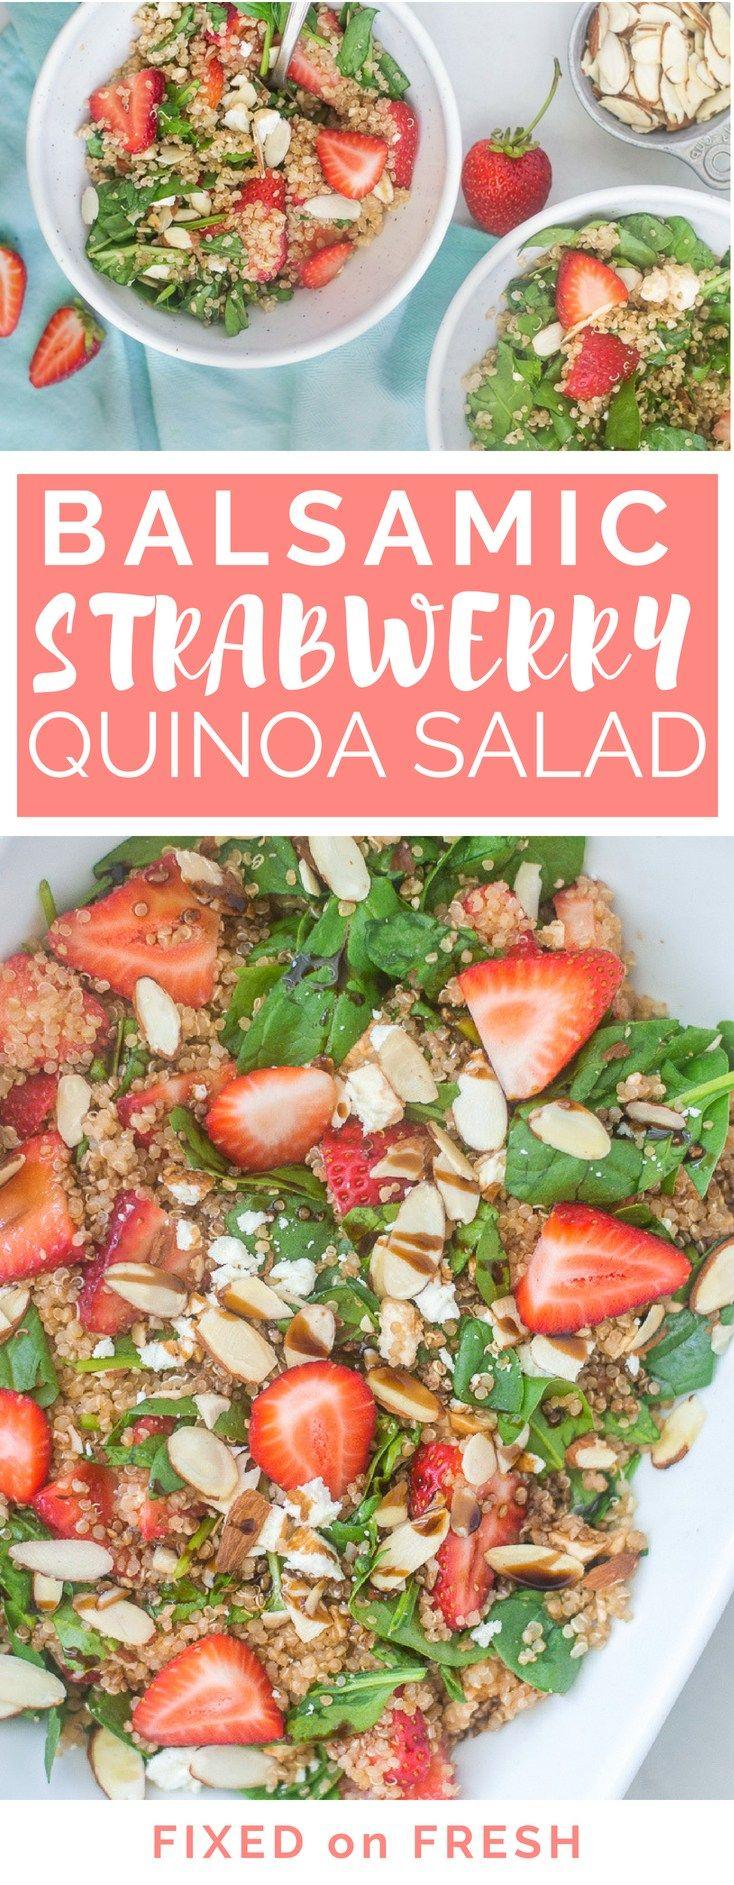 Balsamic Strawberry Quinoa Salad